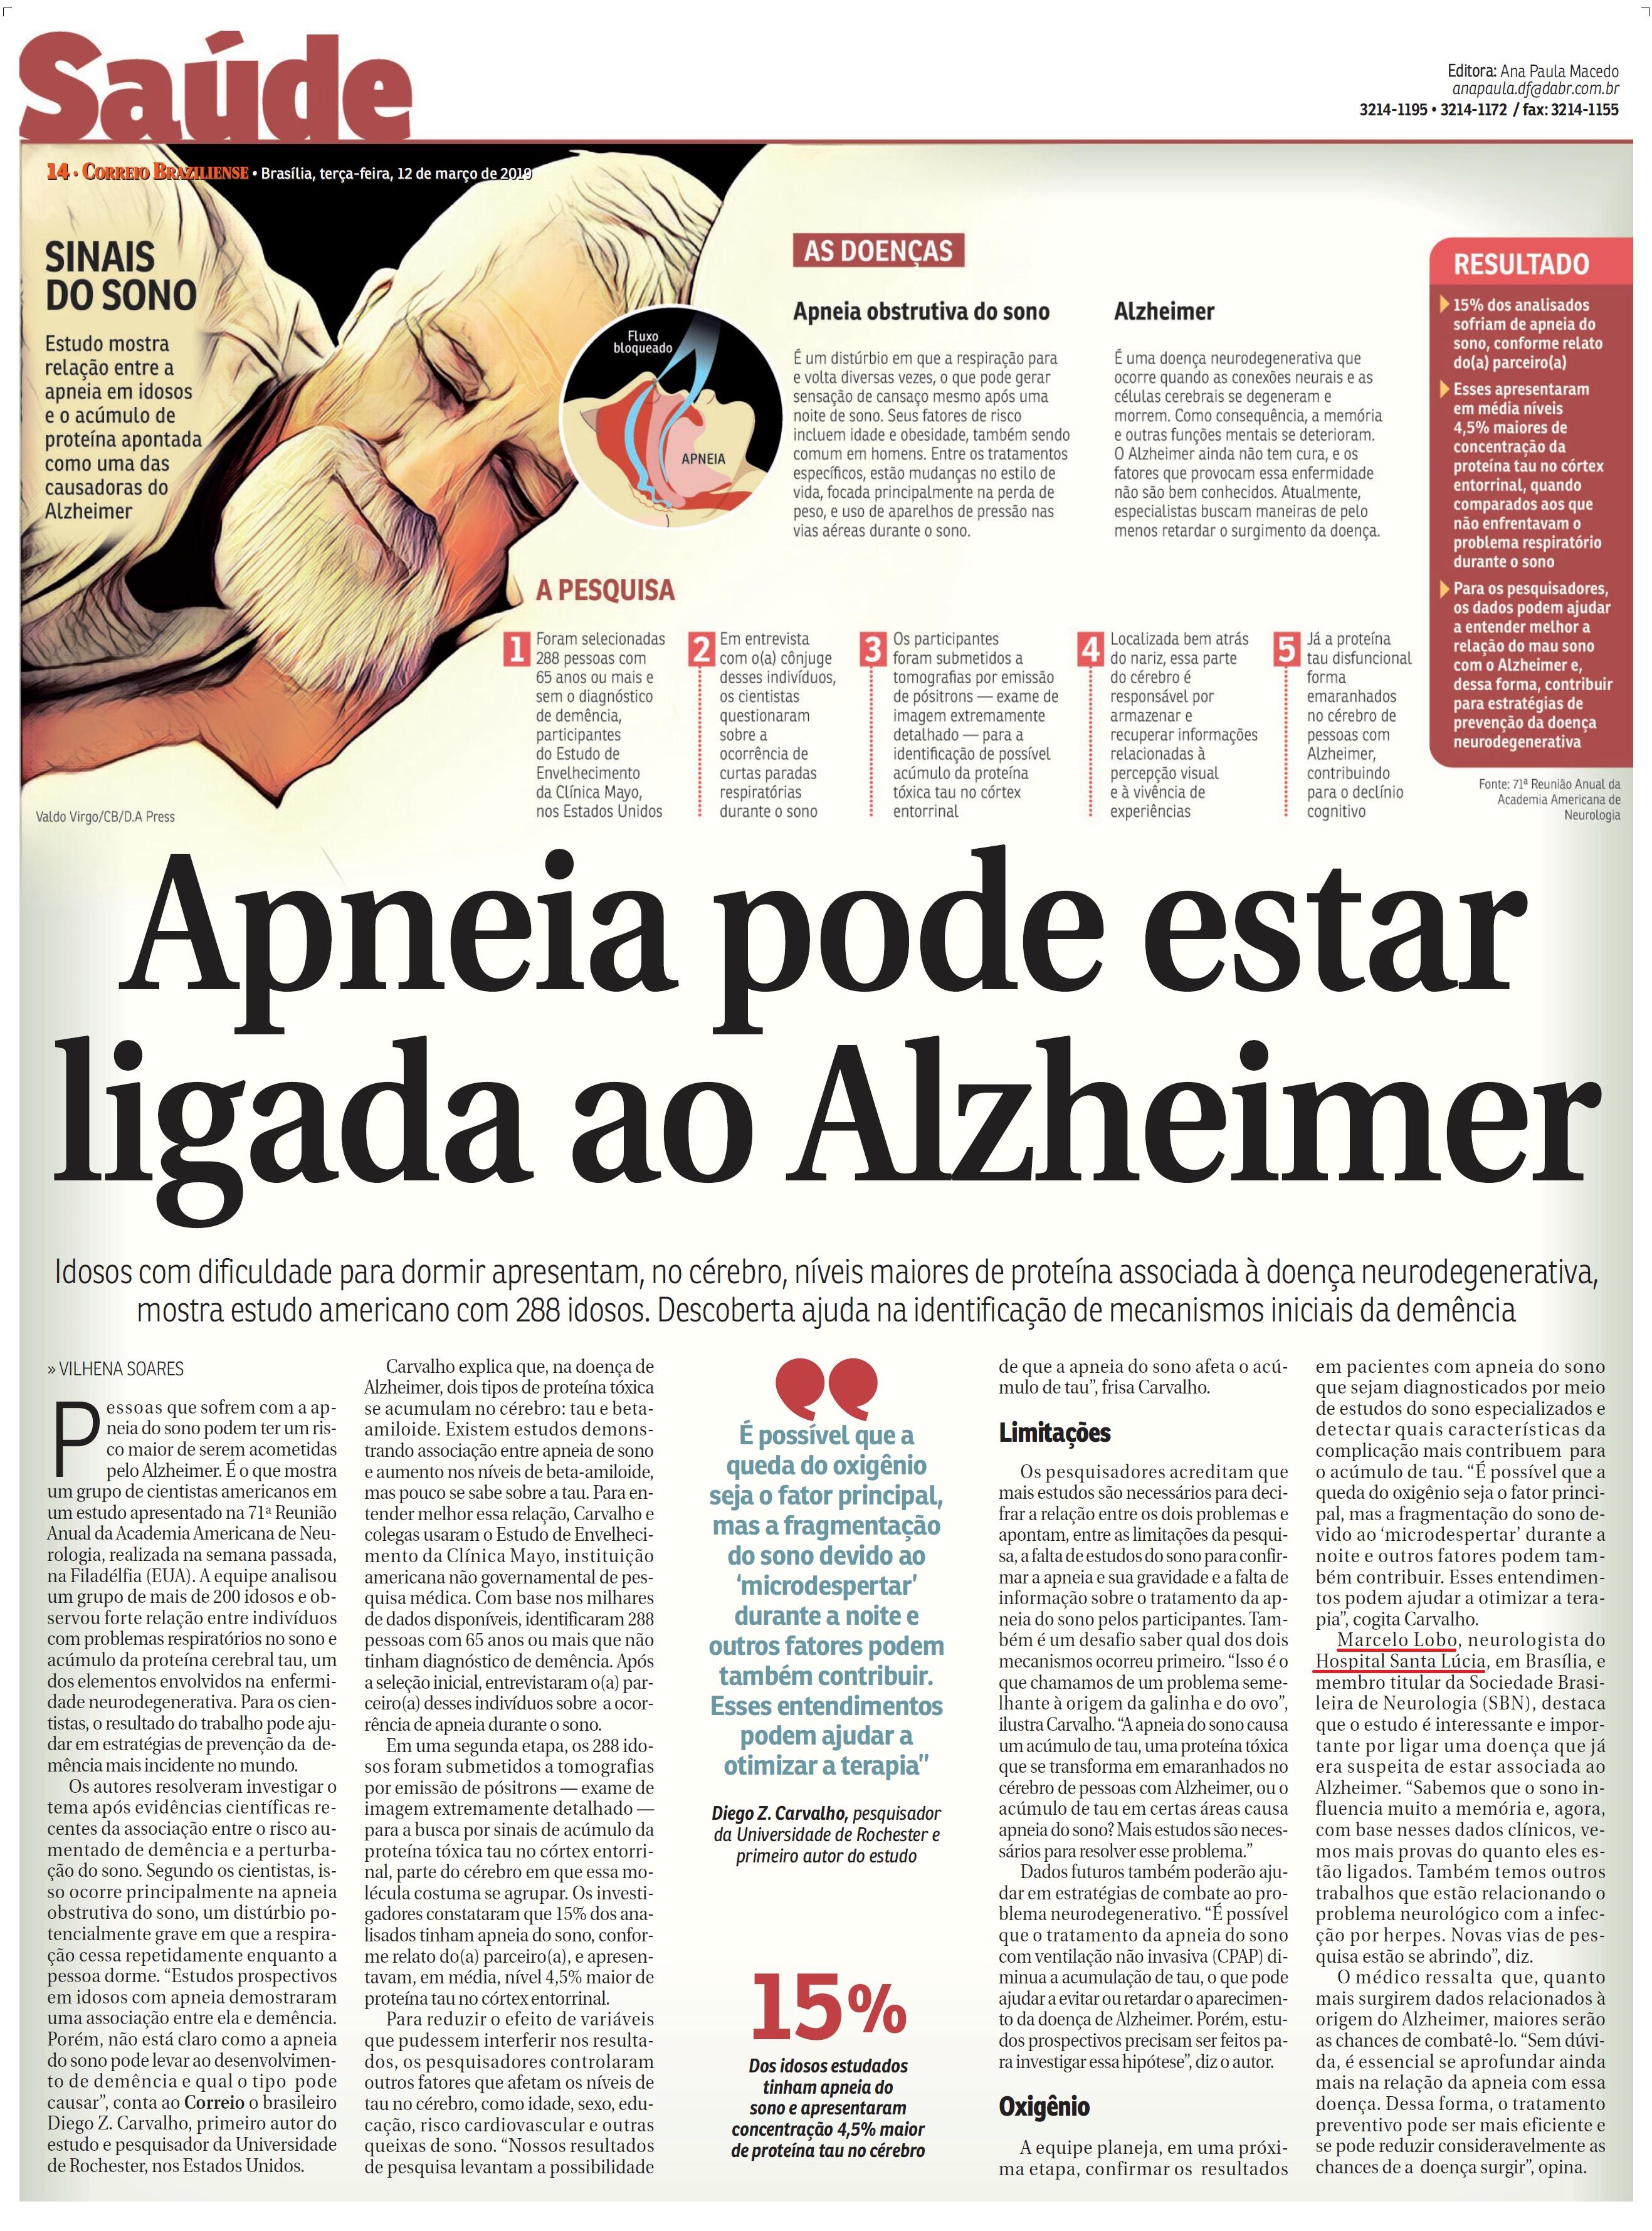 Correio Braziliense - Dr. Marcelo Lobo HSLS - 12-03-2019